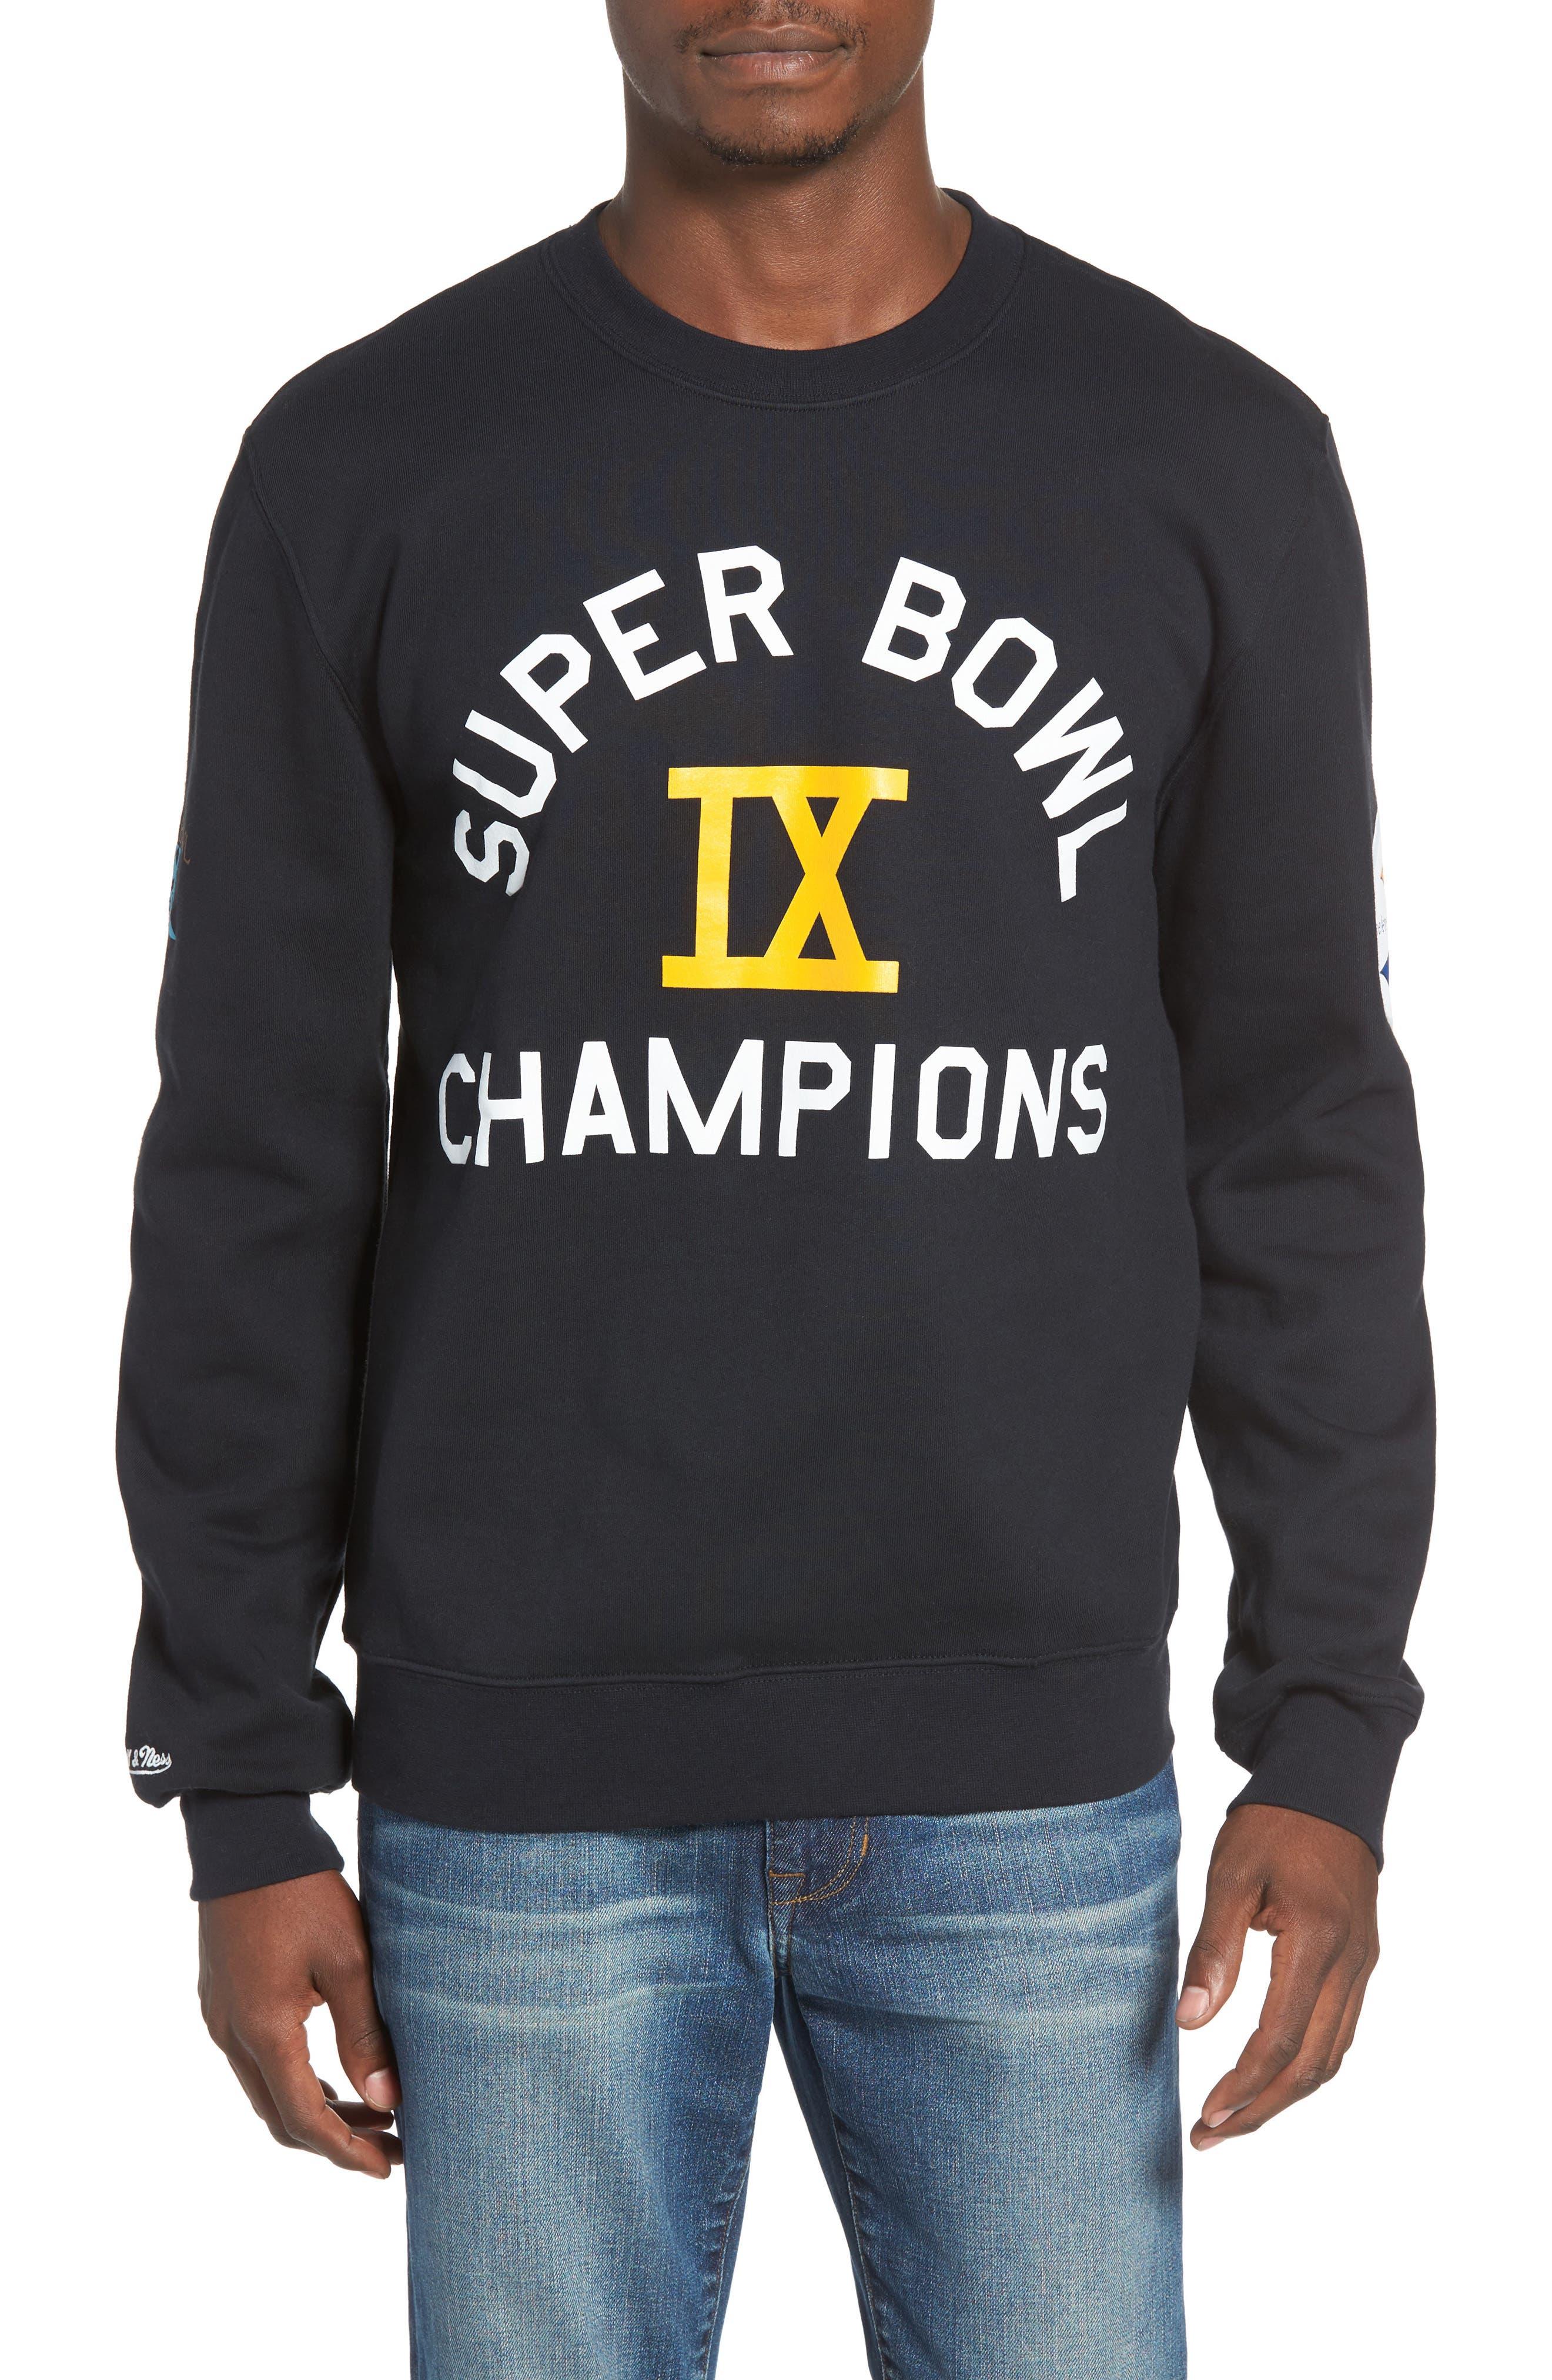 NFL Championship - Pittsburgh Steelers Sweatshirt,                             Main thumbnail 1, color,                             001